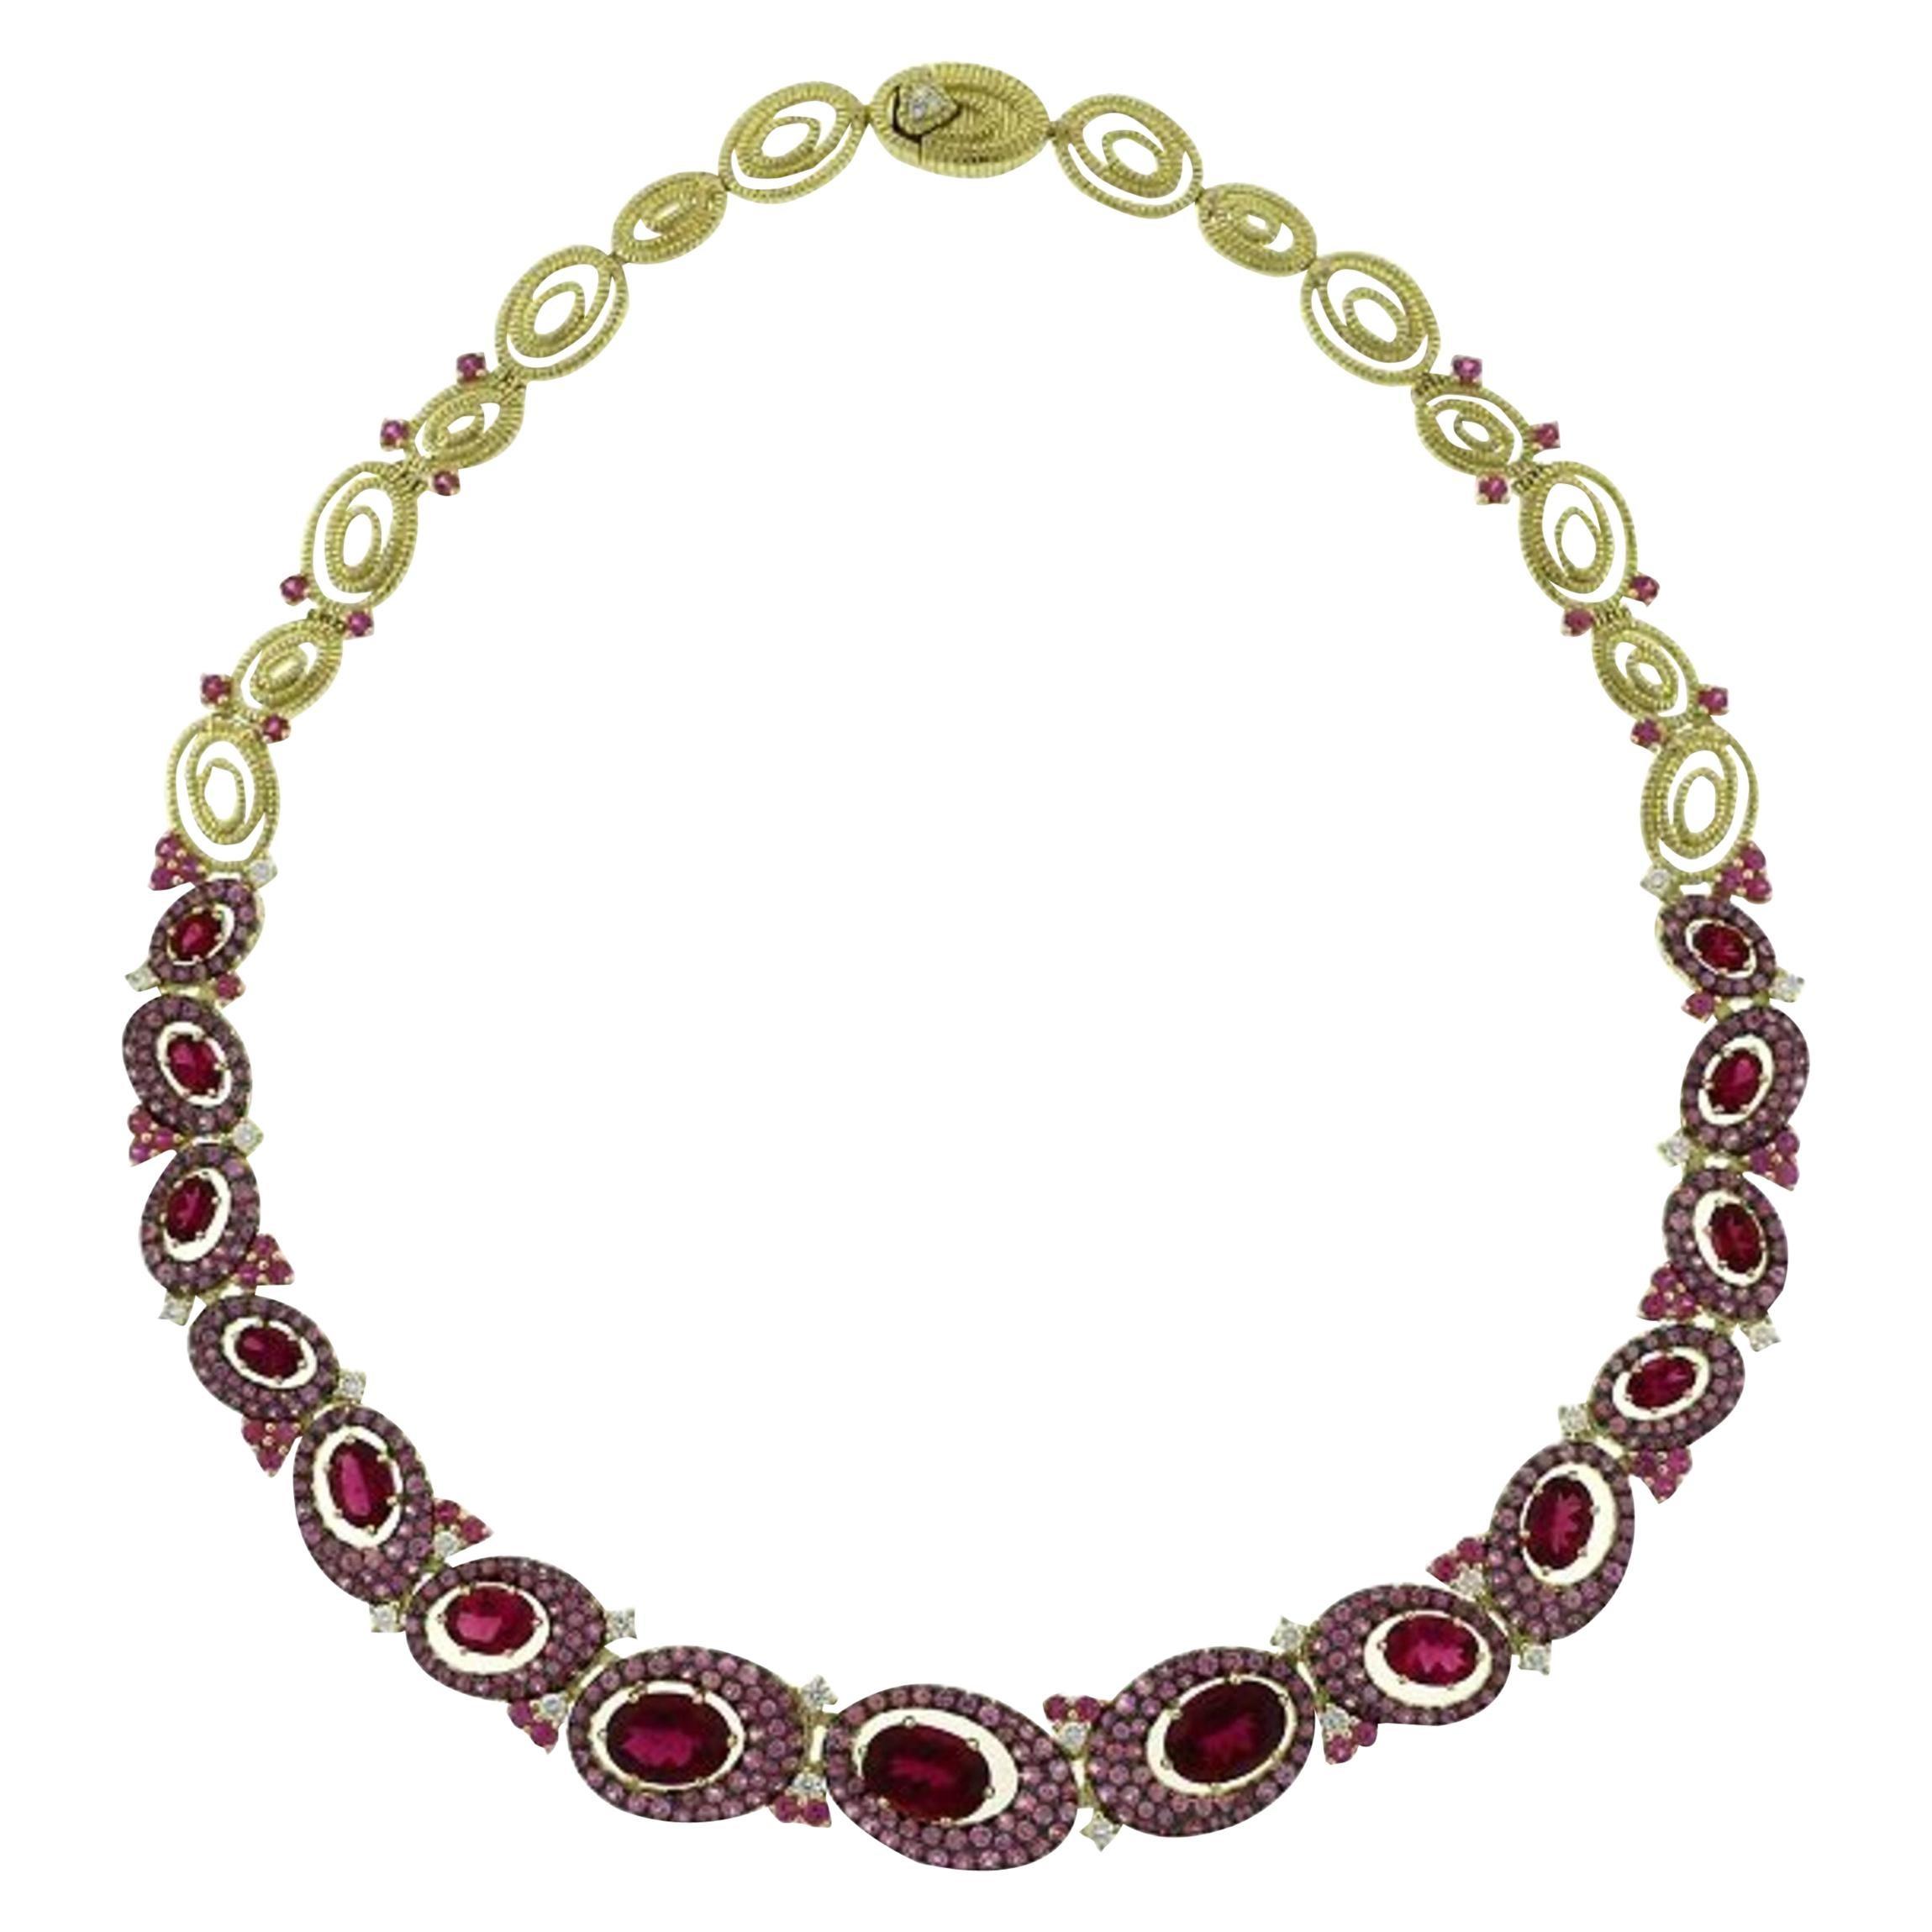 Elegant 18 Karat Yellow Gold, Pink Sapphire, Rubellite and Diamond Necklace